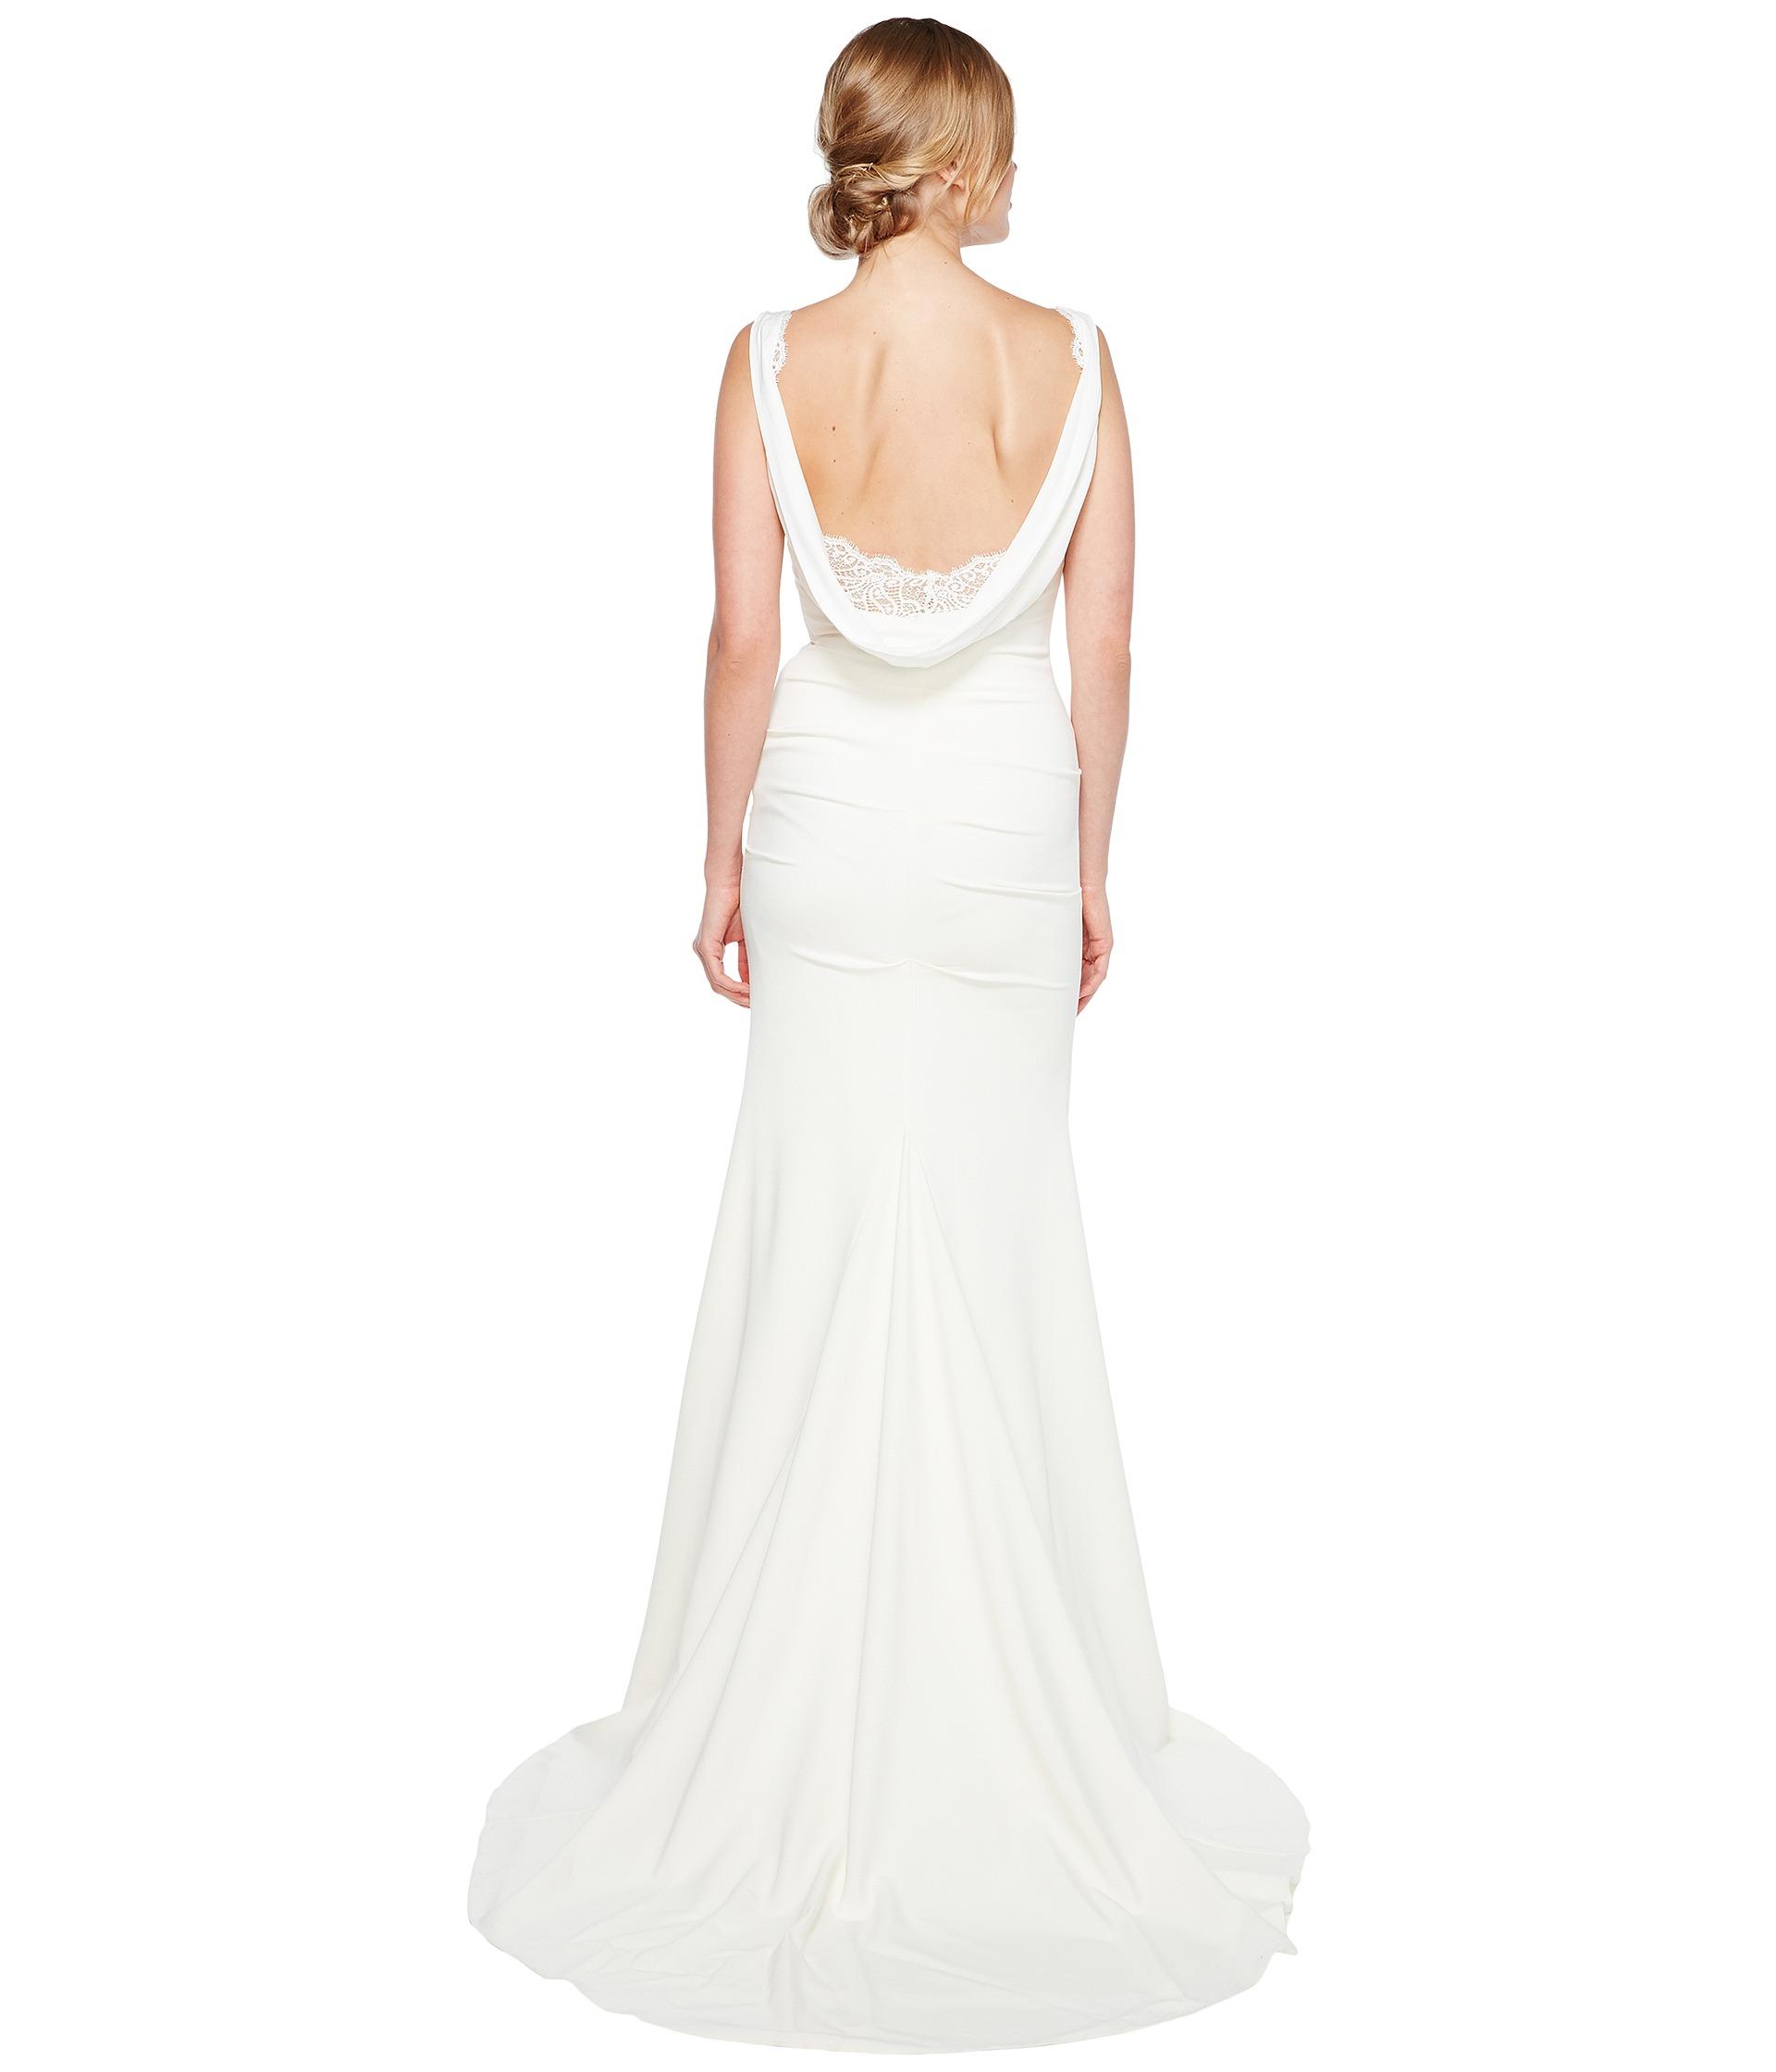 Gallery Nicole Miller Bridal Wedding Dresses: Nicole Miller Nina Bridal Gown